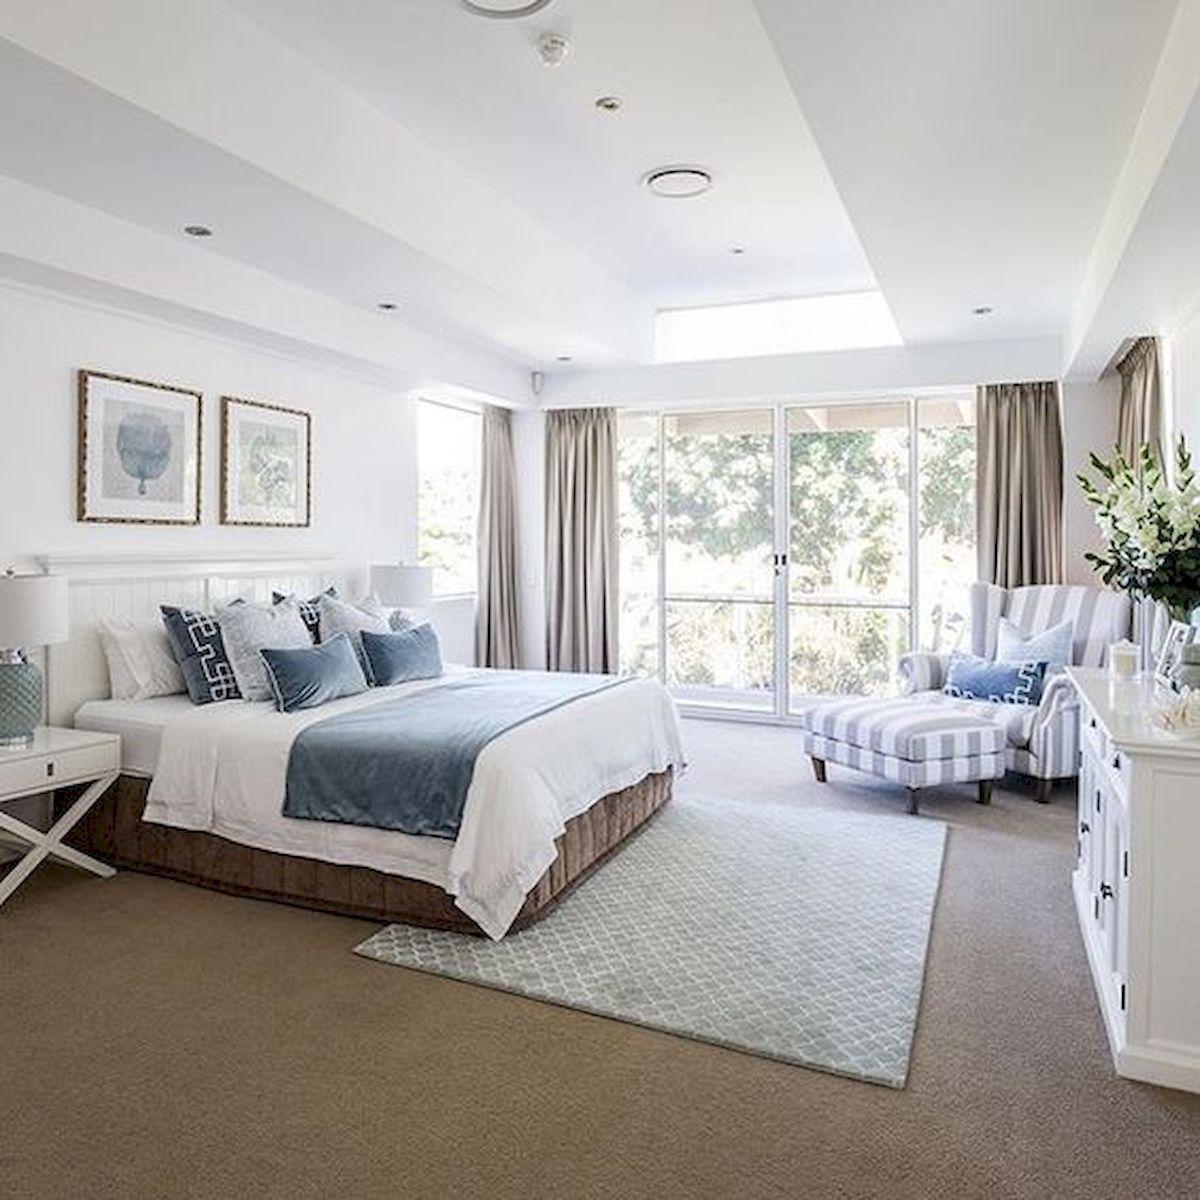 100 Elegant Farmhouse Master Bedroom Decor Ideas With Images